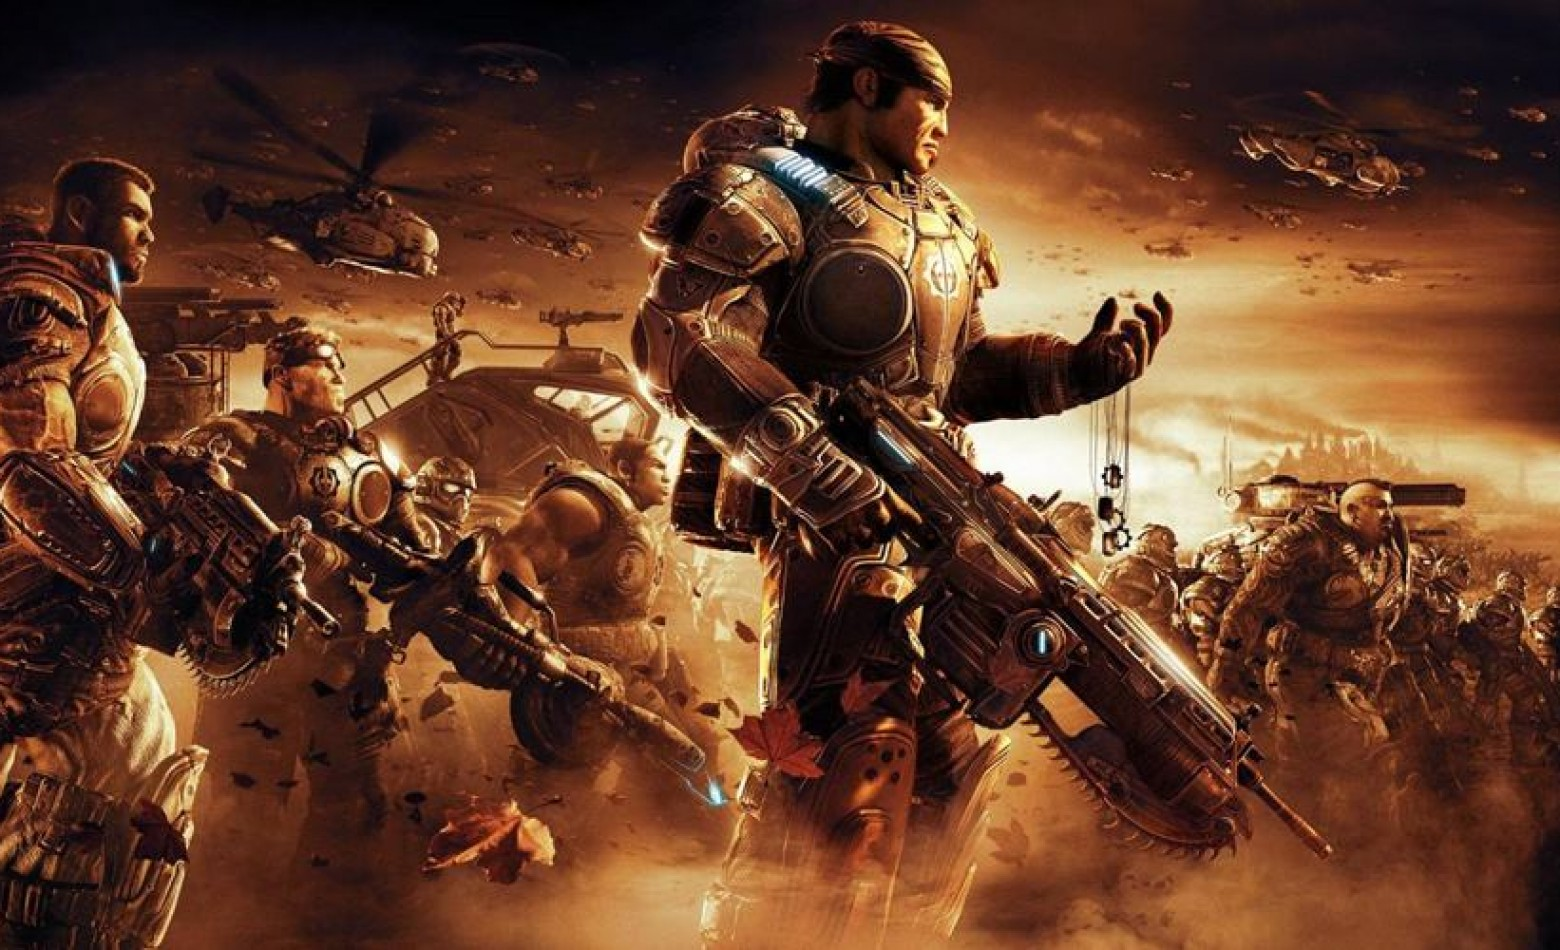 Novo Gears of War ainda vai demorar para ficar pronto